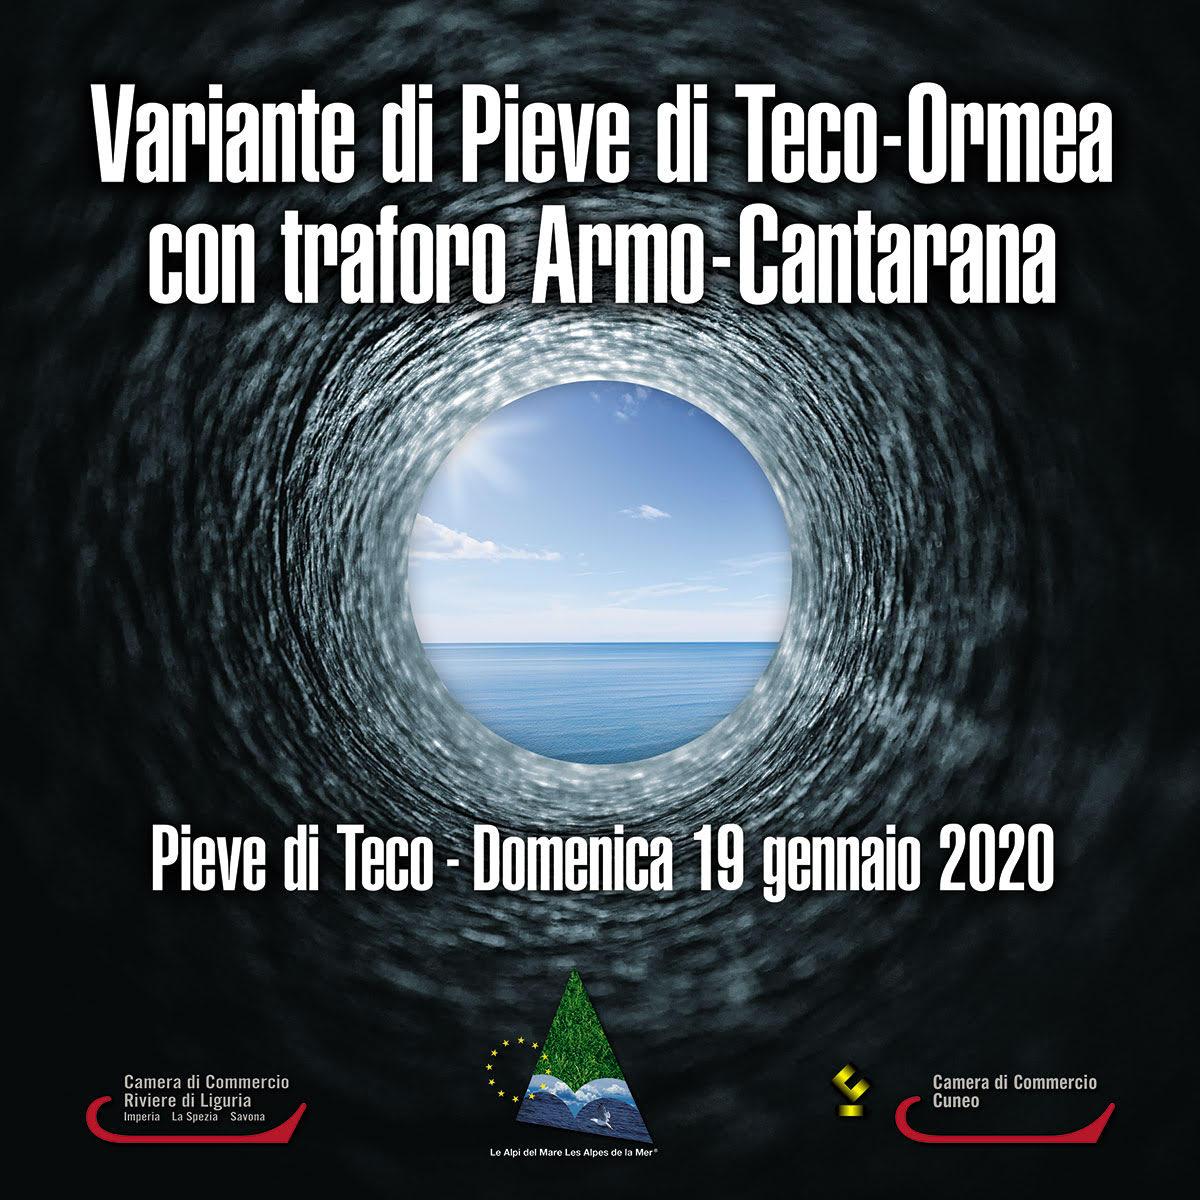 PIEVE DI TECO 19 1 2020 ARMO CANTARANA